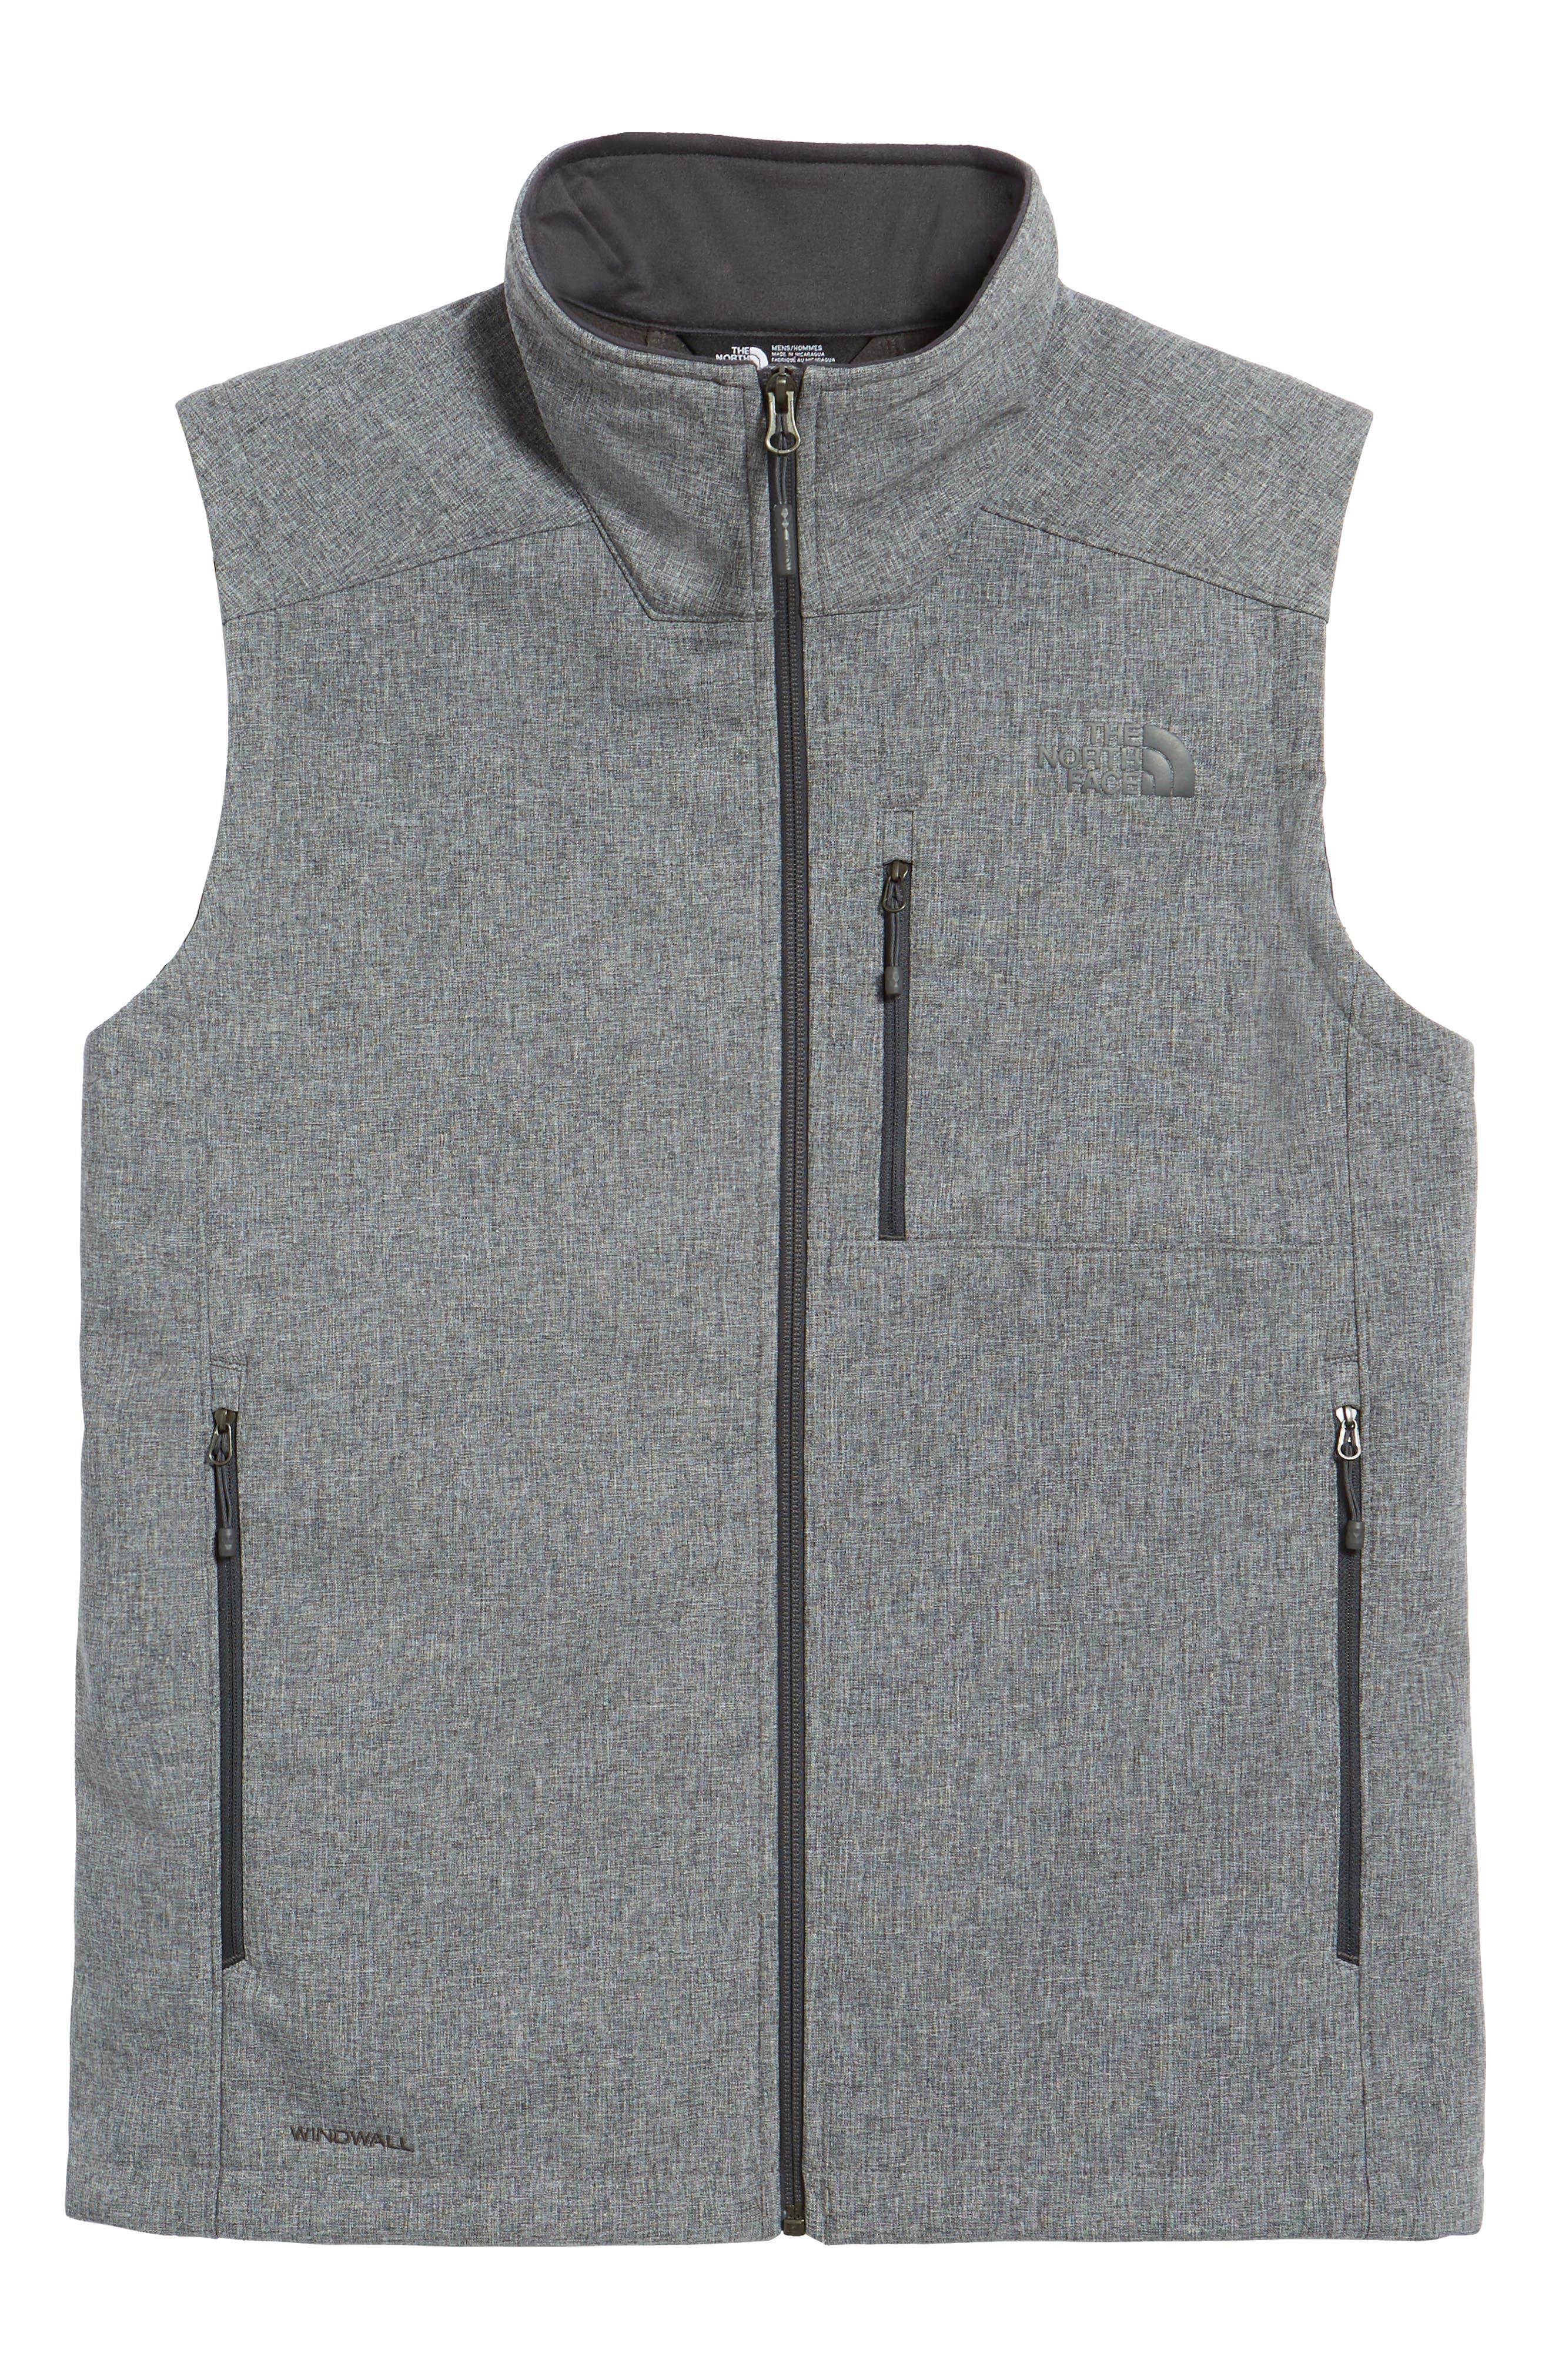 Apex Bionic 2 Vest,                             Alternate thumbnail 6, color,                             Tnf Medium Grey Heather